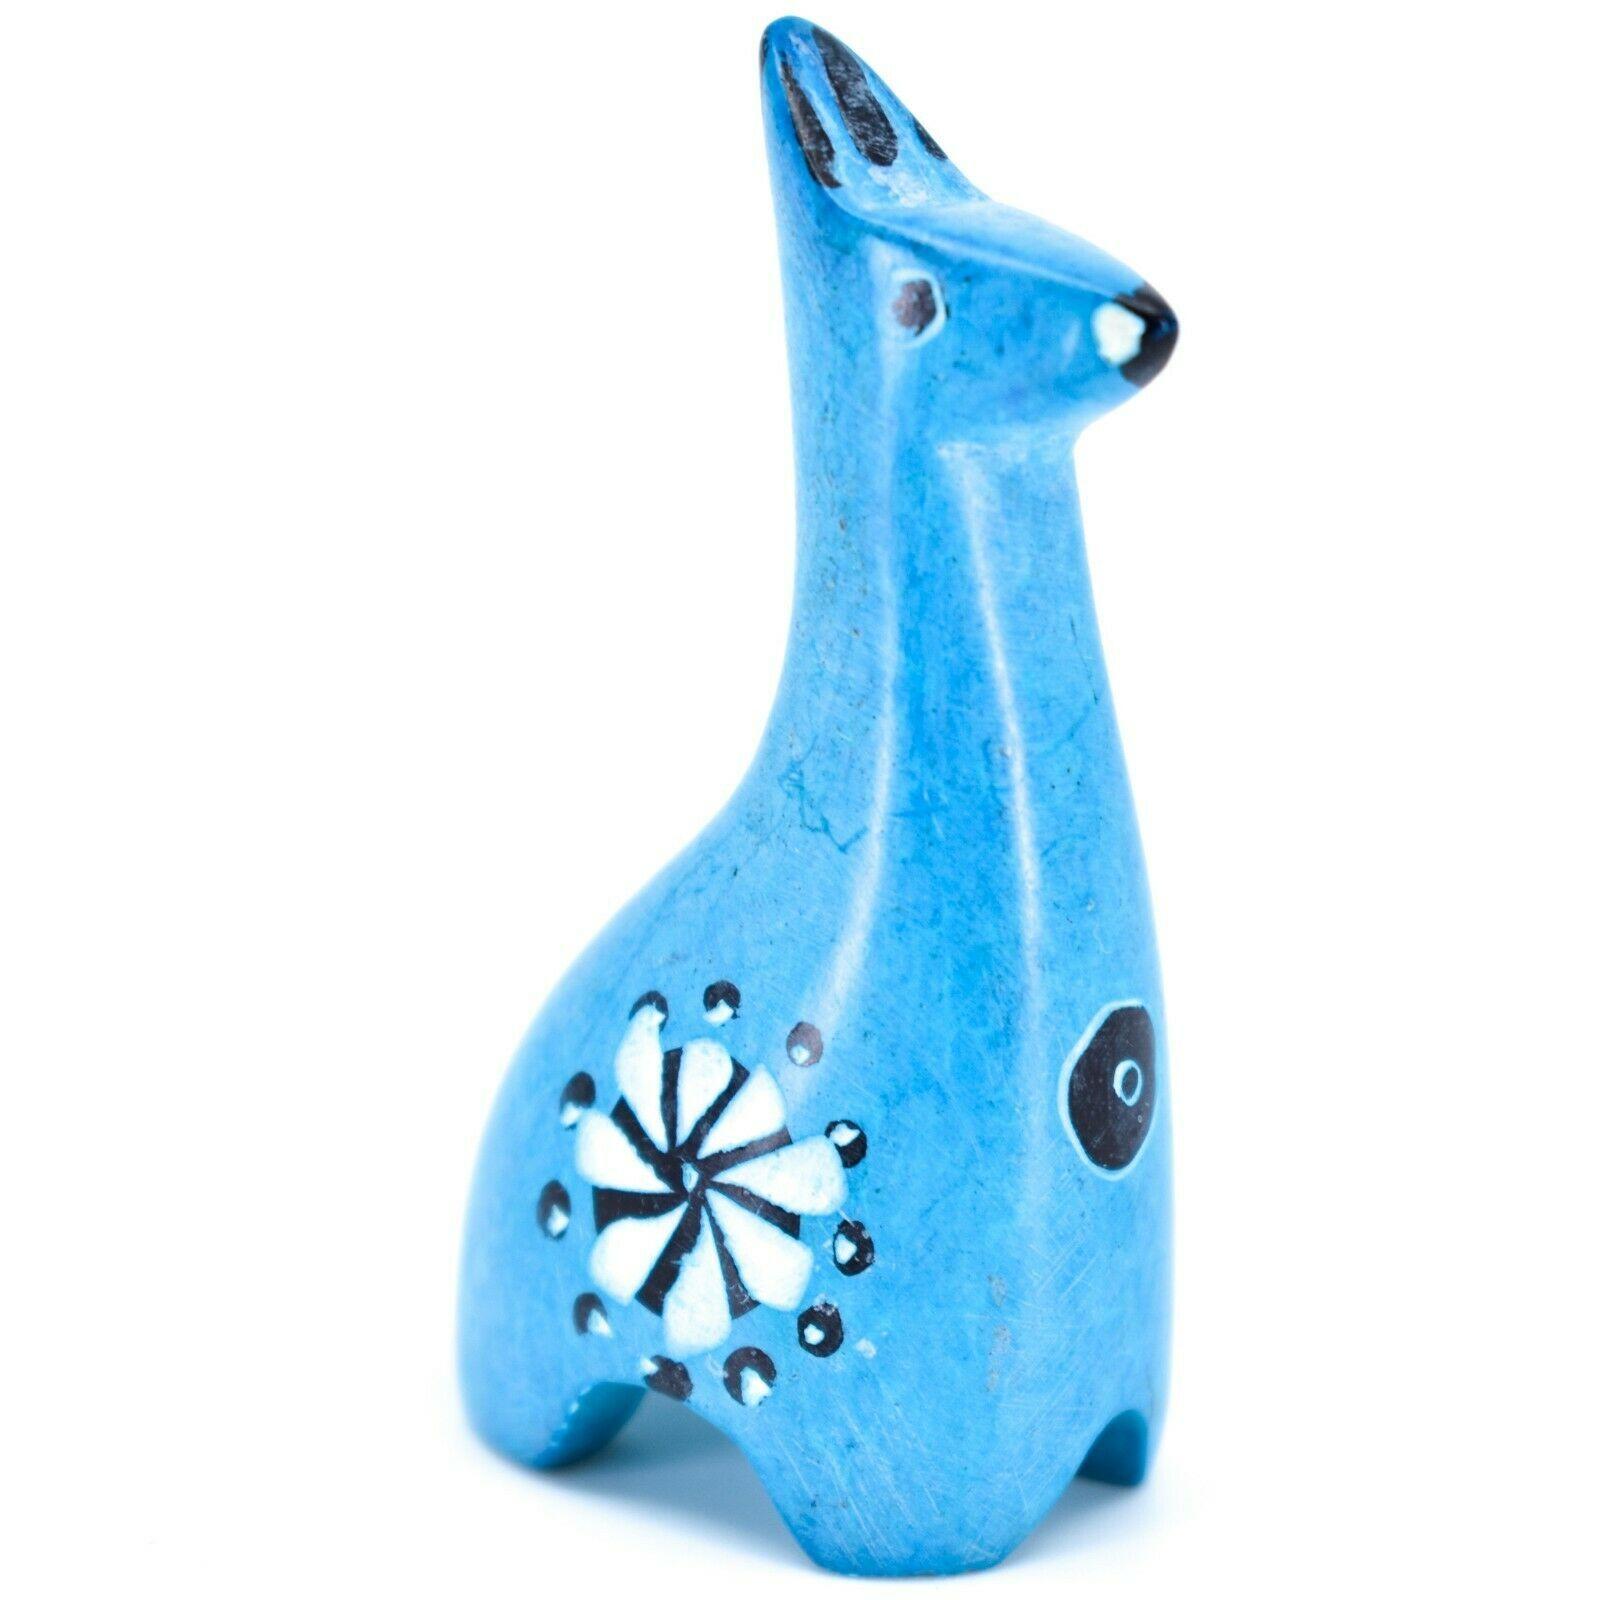 Tabaka Chigware Hand Carved Kisii Soapstone Miniature Sky Blue Giraffe Figurine